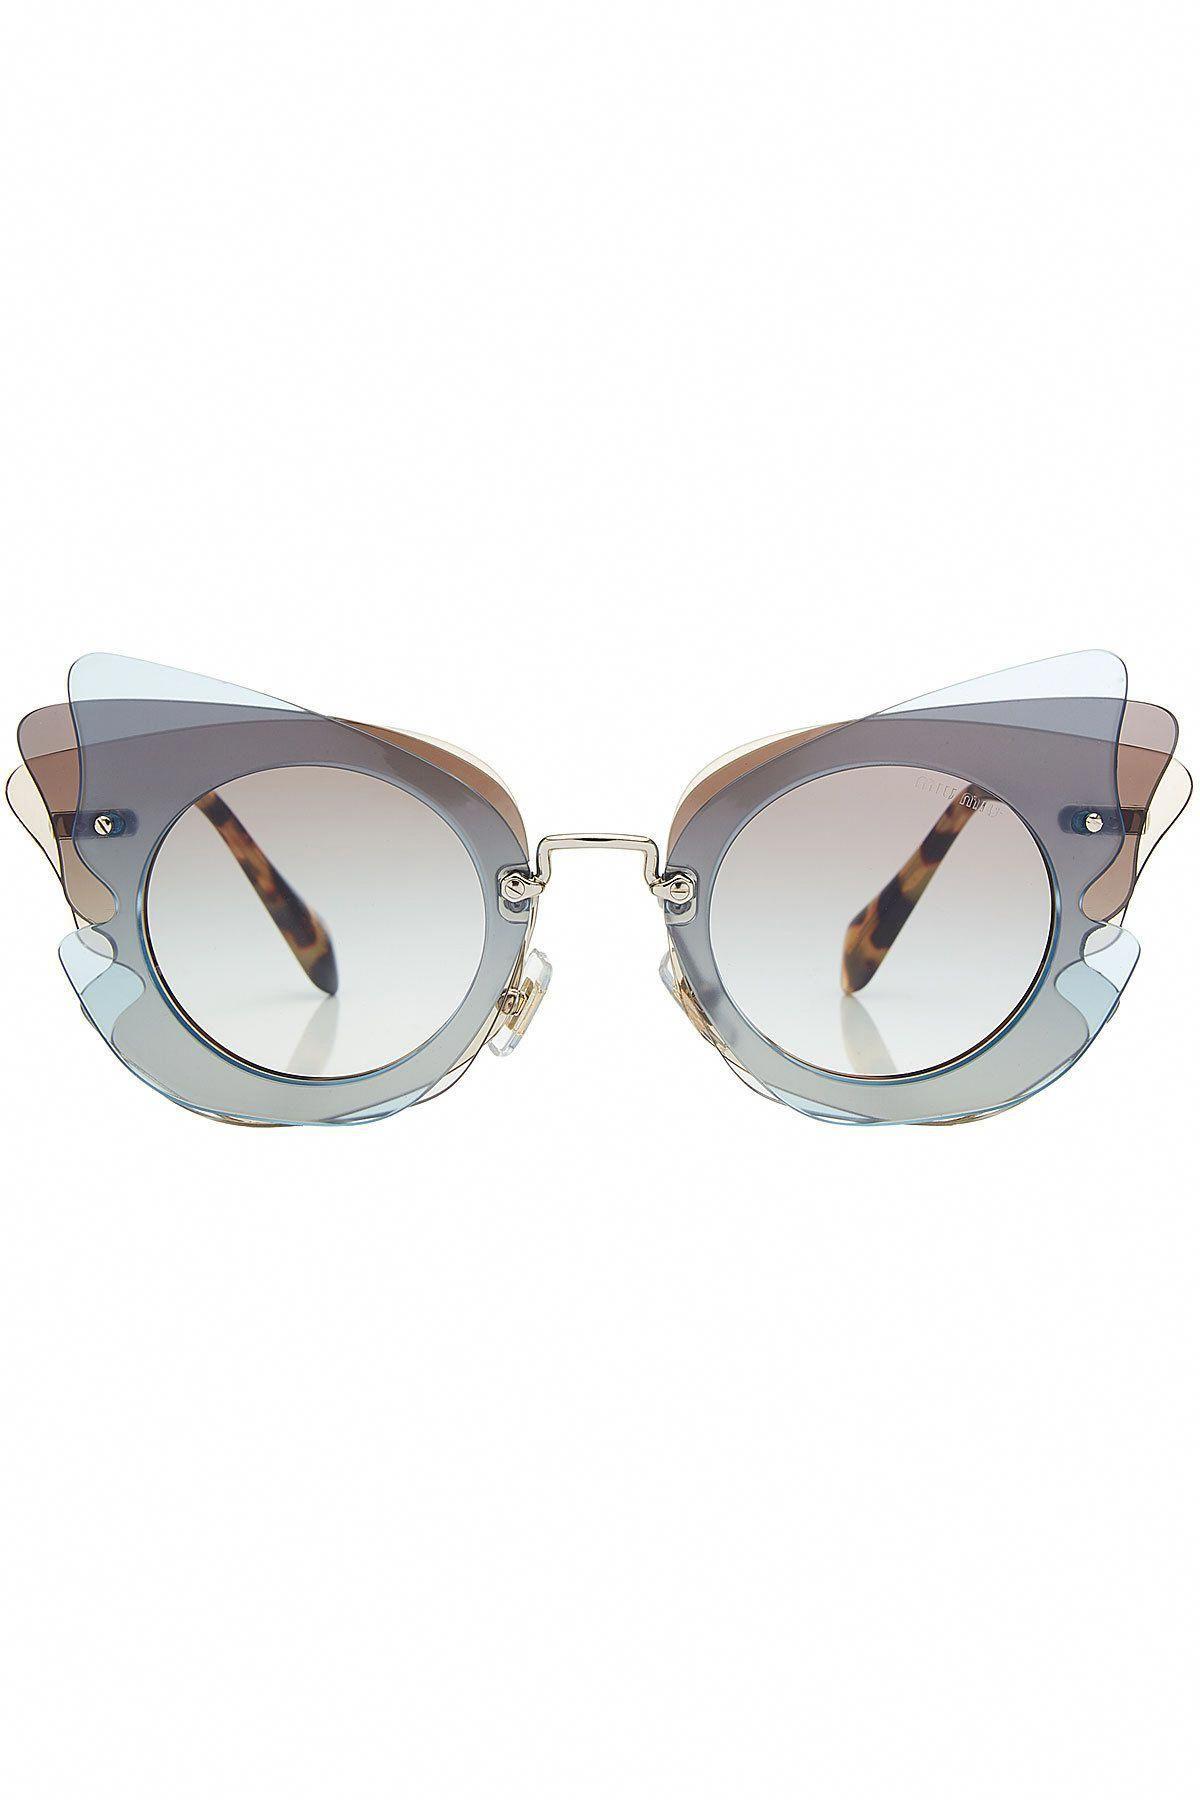 1eaf5efa56c Miu Miu - Butterfly Sunglasses